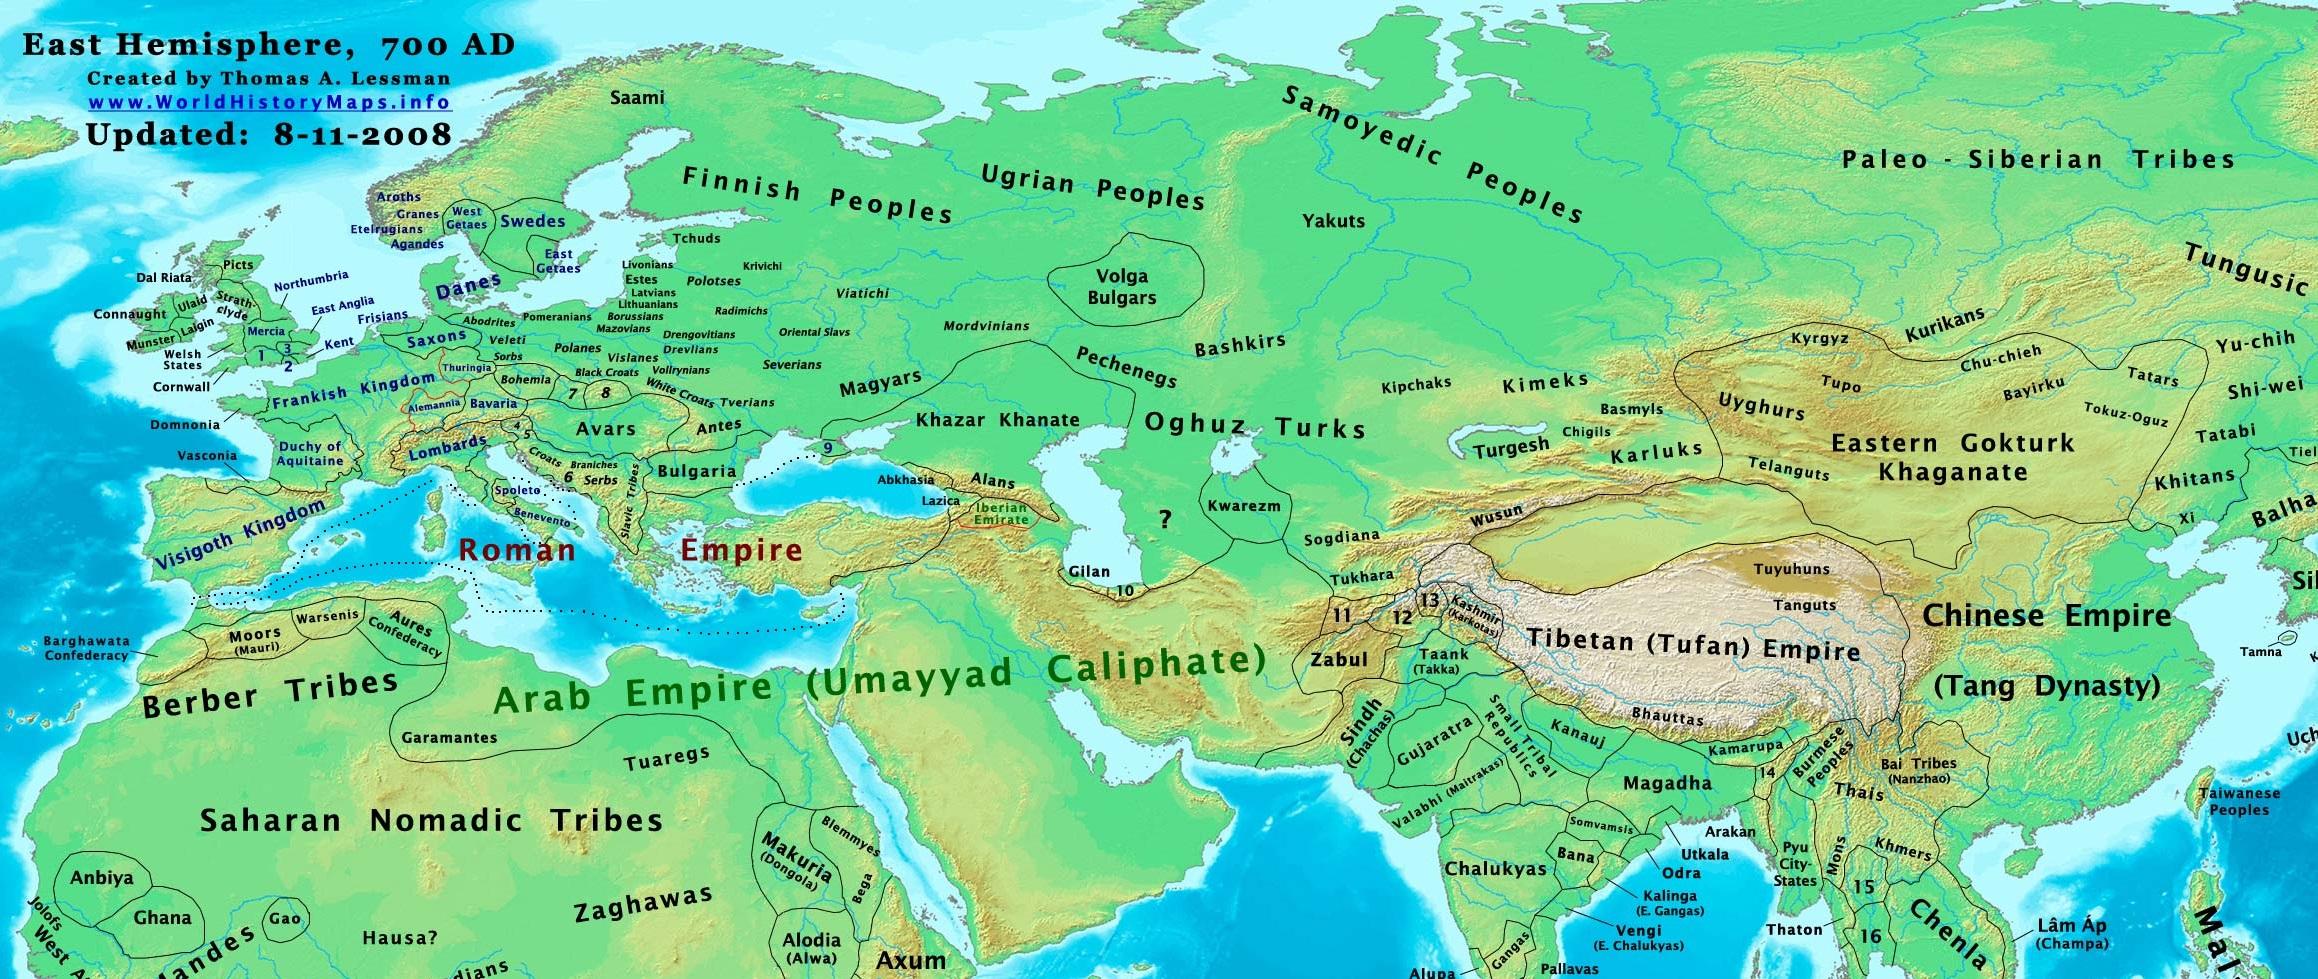 700 AD